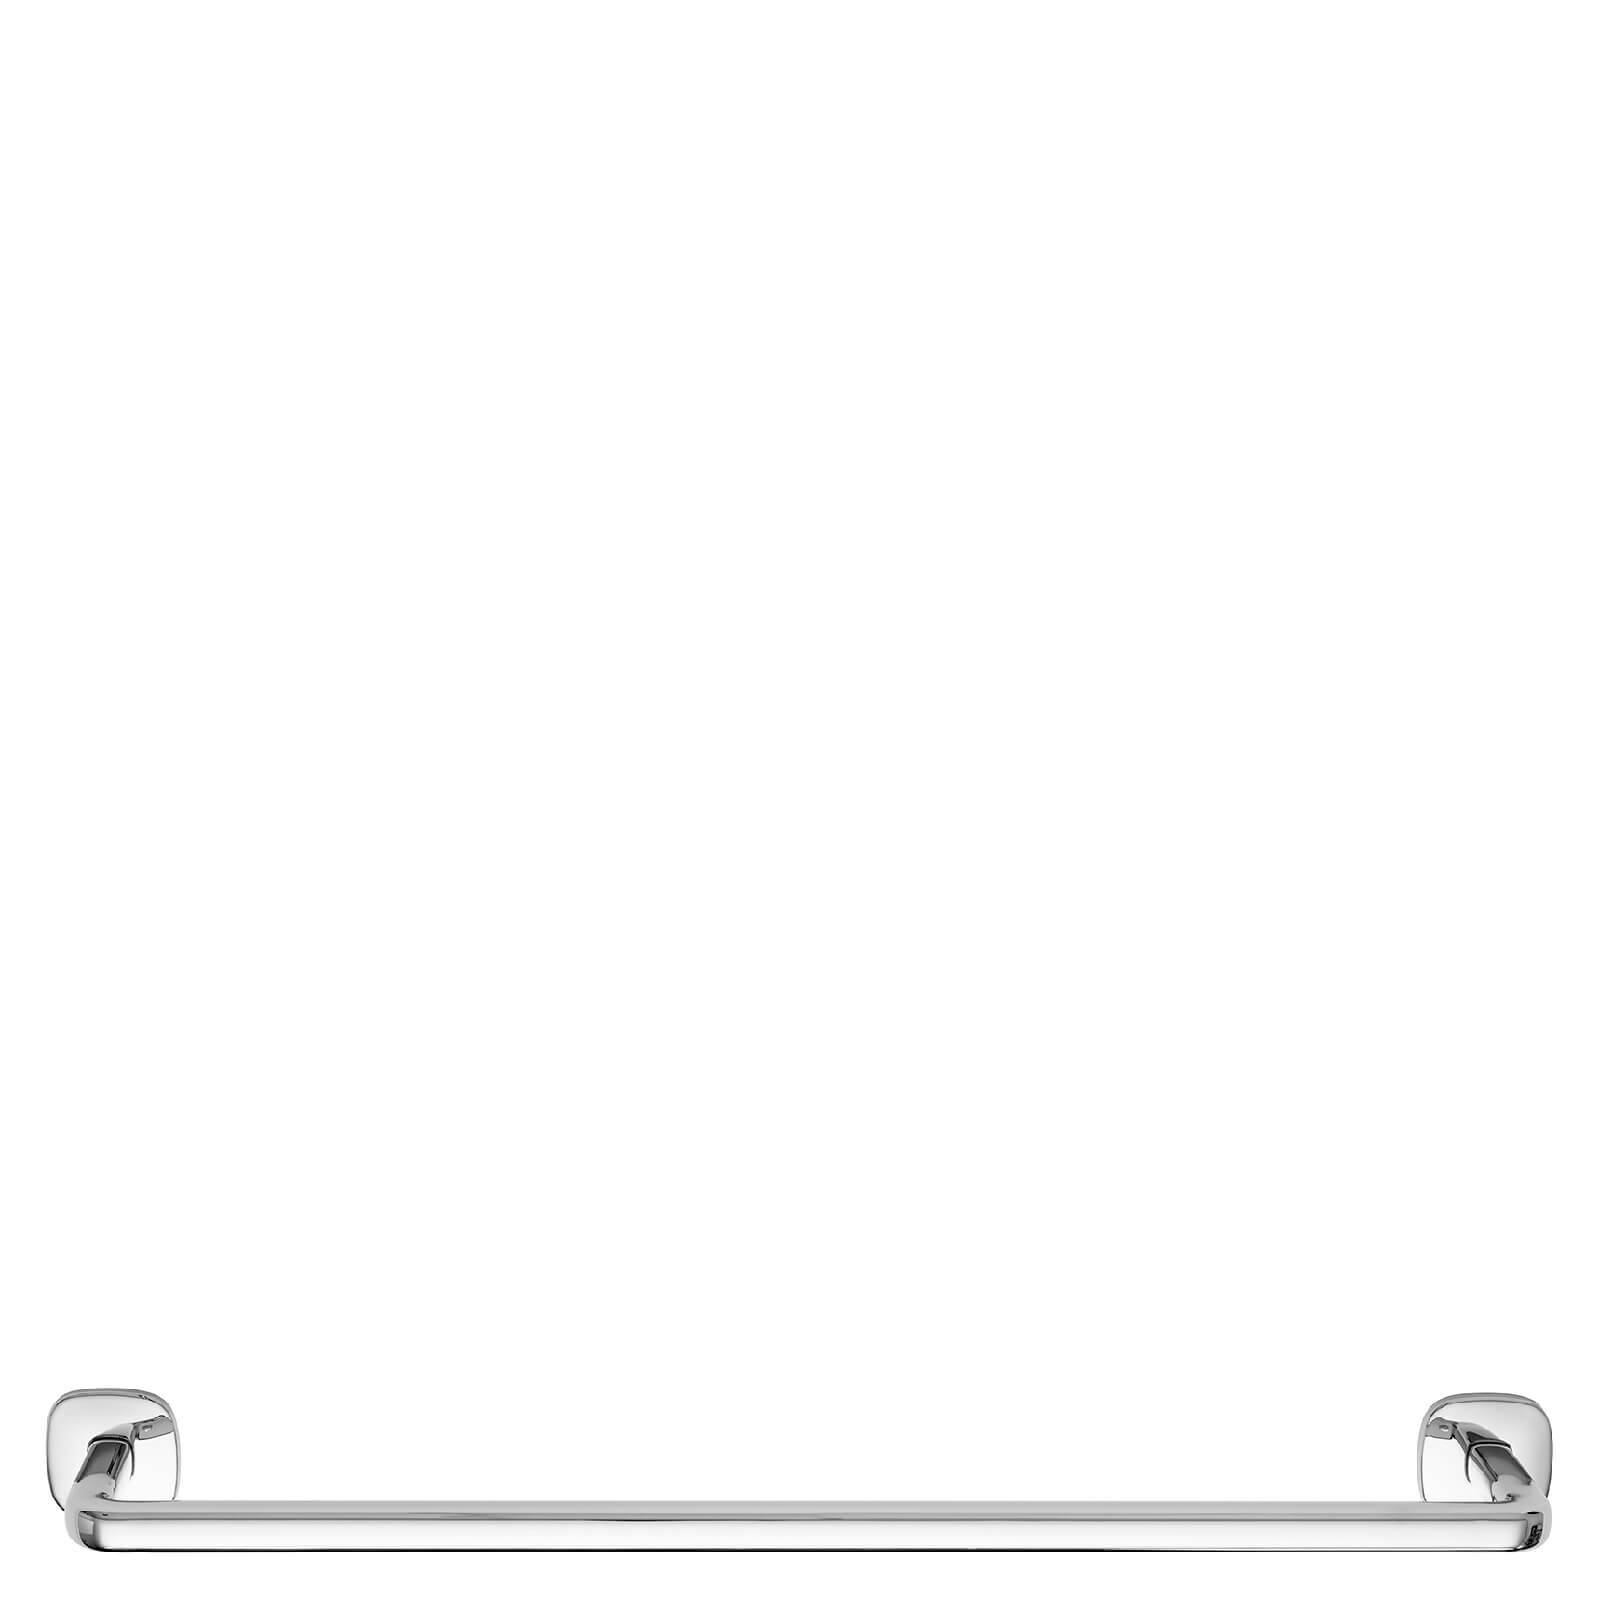 Robert Welch Burford Towel Rail Single